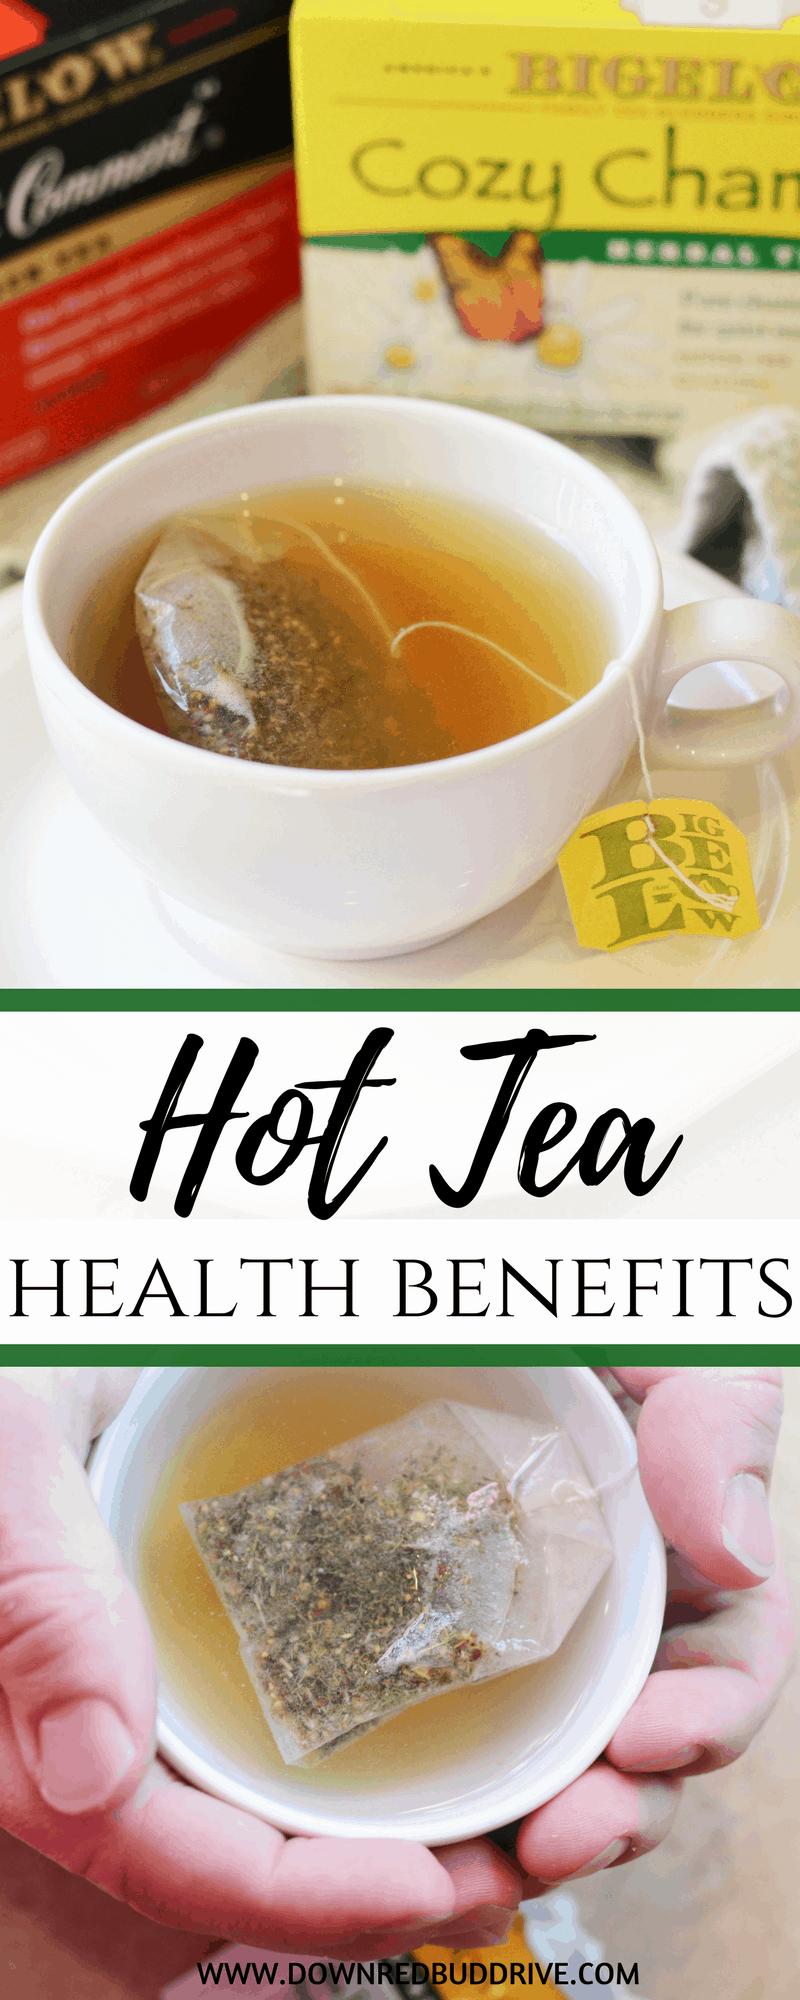 Hot Tea Health Benefits | Hot Tea | Drinking Hot Tea | Hot Tea for Health | Healthy Hot Tea | Is Hot Tea Healthy | Why Drink Hot Tea | How Tea Cleanse | Down Redbud Drive #hottea #healthydrink #hotteacleanse